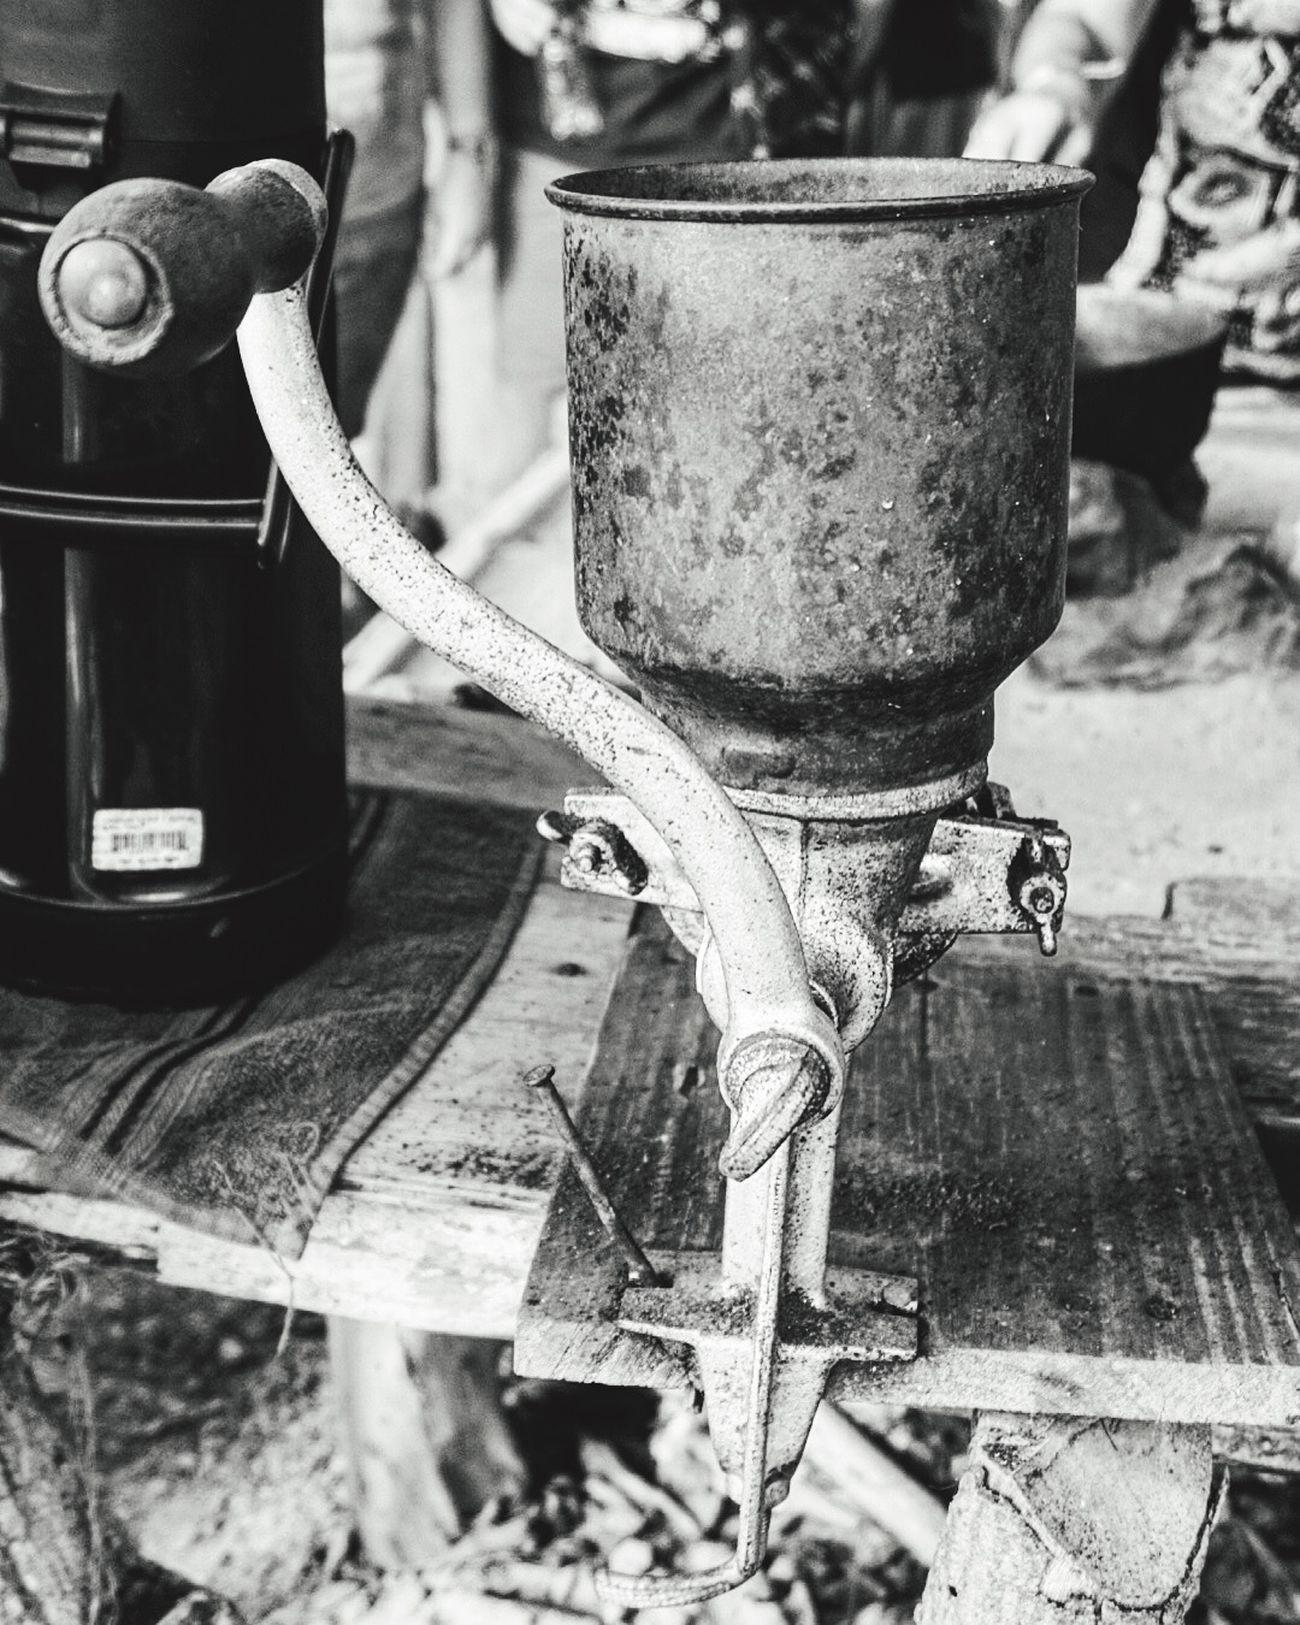 Coffee #cafe #instacoffee #TagsForLikes #cafelife #caffeine #hot #mug #drink #coffeeaddict #coffeegram #coffeeoftheday #cotd #coffeelover #coffeelovers #coffeeholic #coffiecup #coffeelove #coffeemug @TagsForLikes #coffeeholic #coffeelife Coffee Coffee Grinder Blackandwhite Blackandwhite Photography EyeEm Best Shots - Black + White Blackandwhitephotography